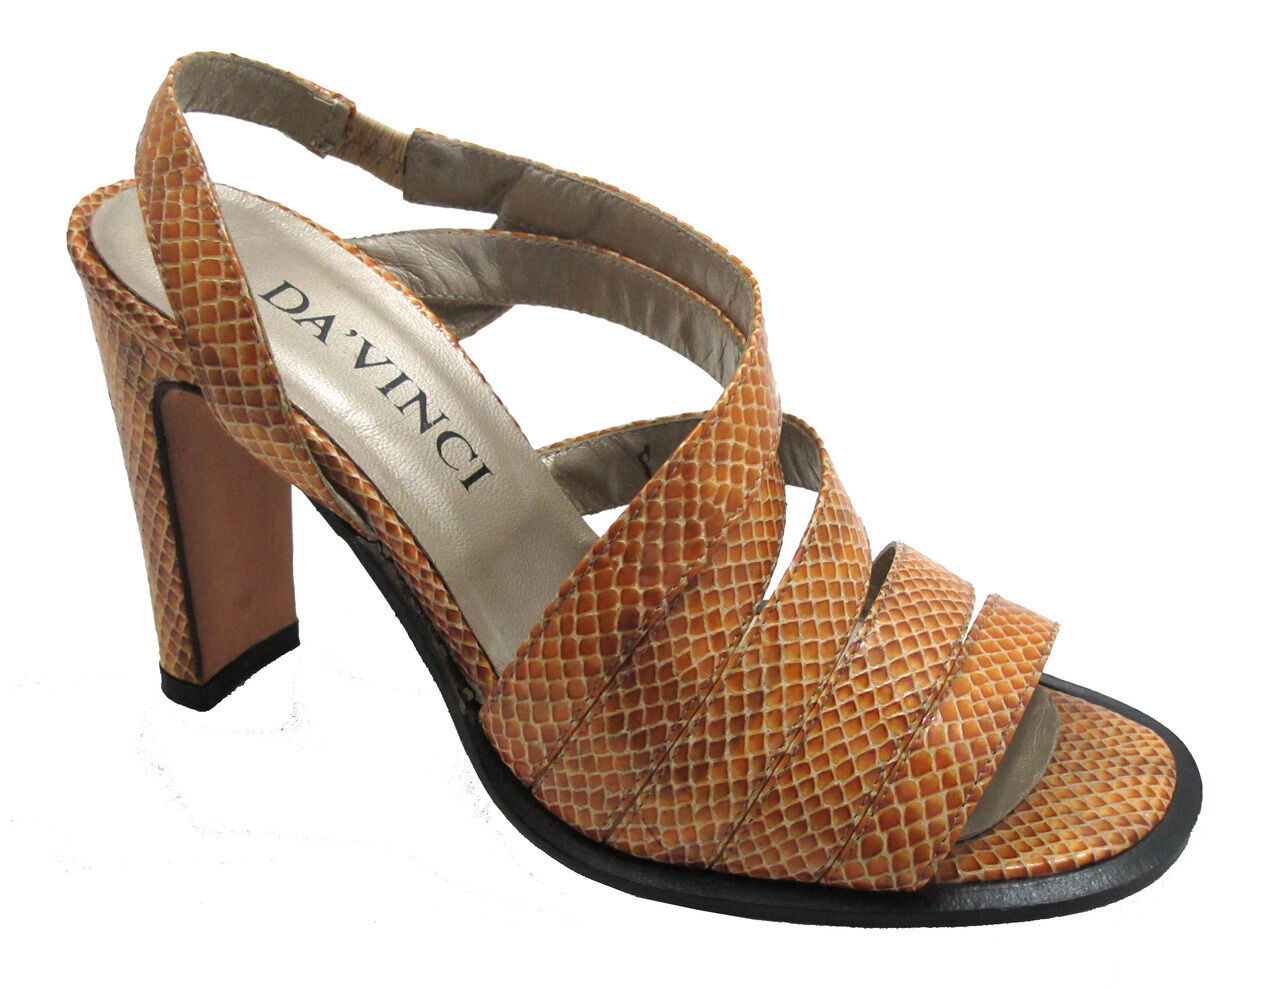 Davinci F89 Wouomo Strappy Sandal snake skin in nero grigio